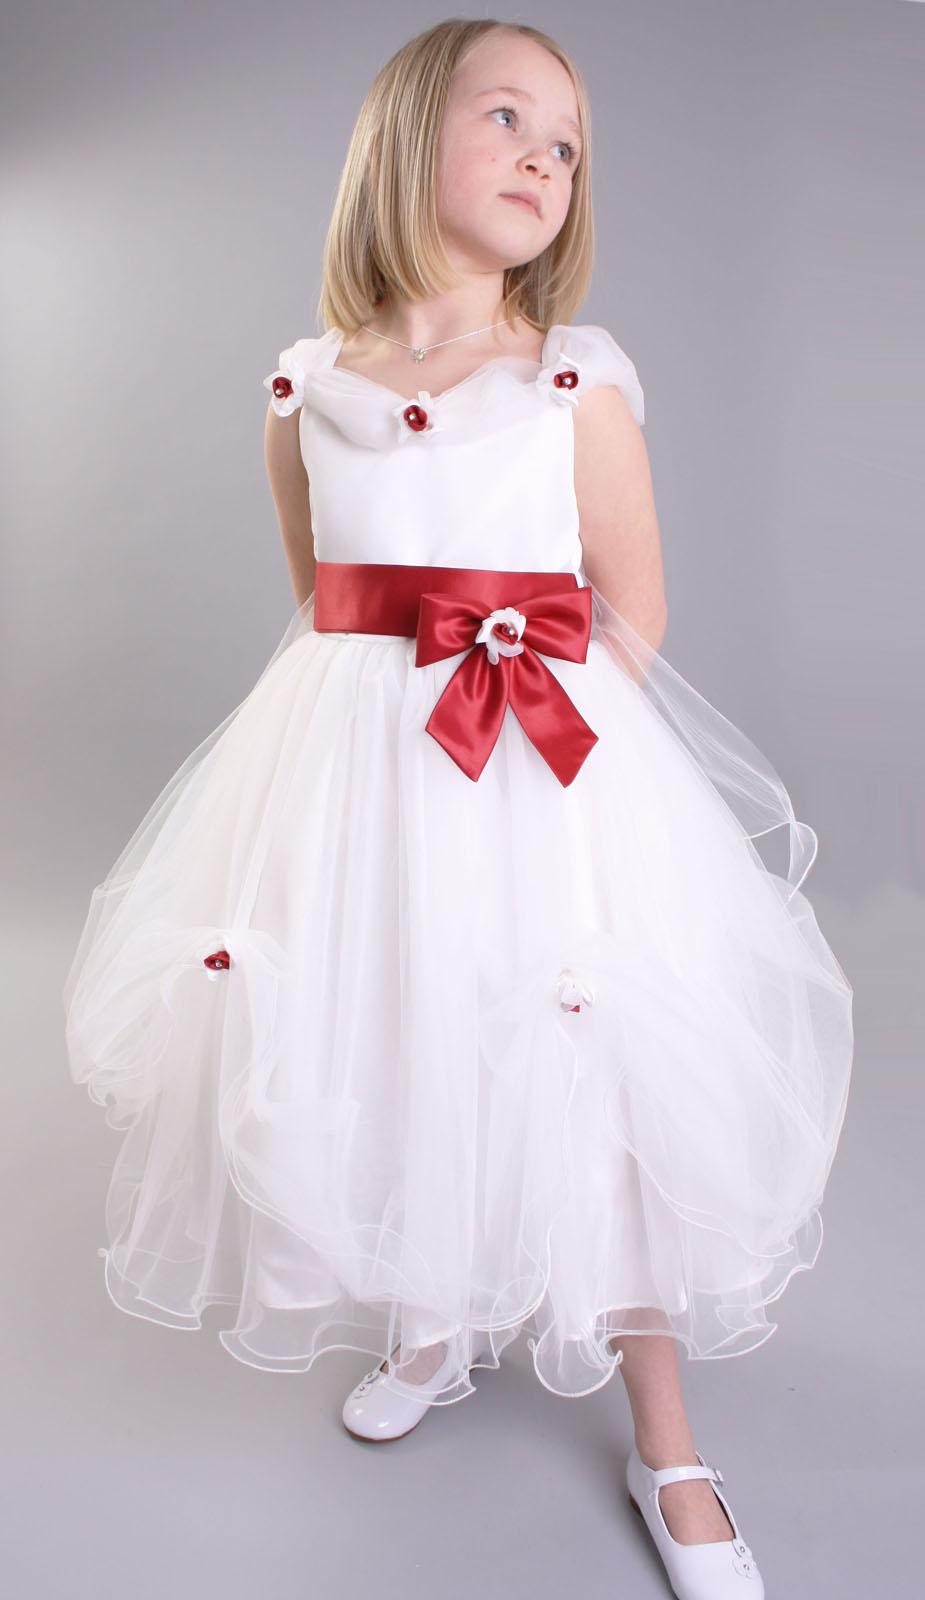 Id et photo d coration mariage petite robe blanche robe blanche pour filles robe fille - Robe de petite fille pour mariage ...